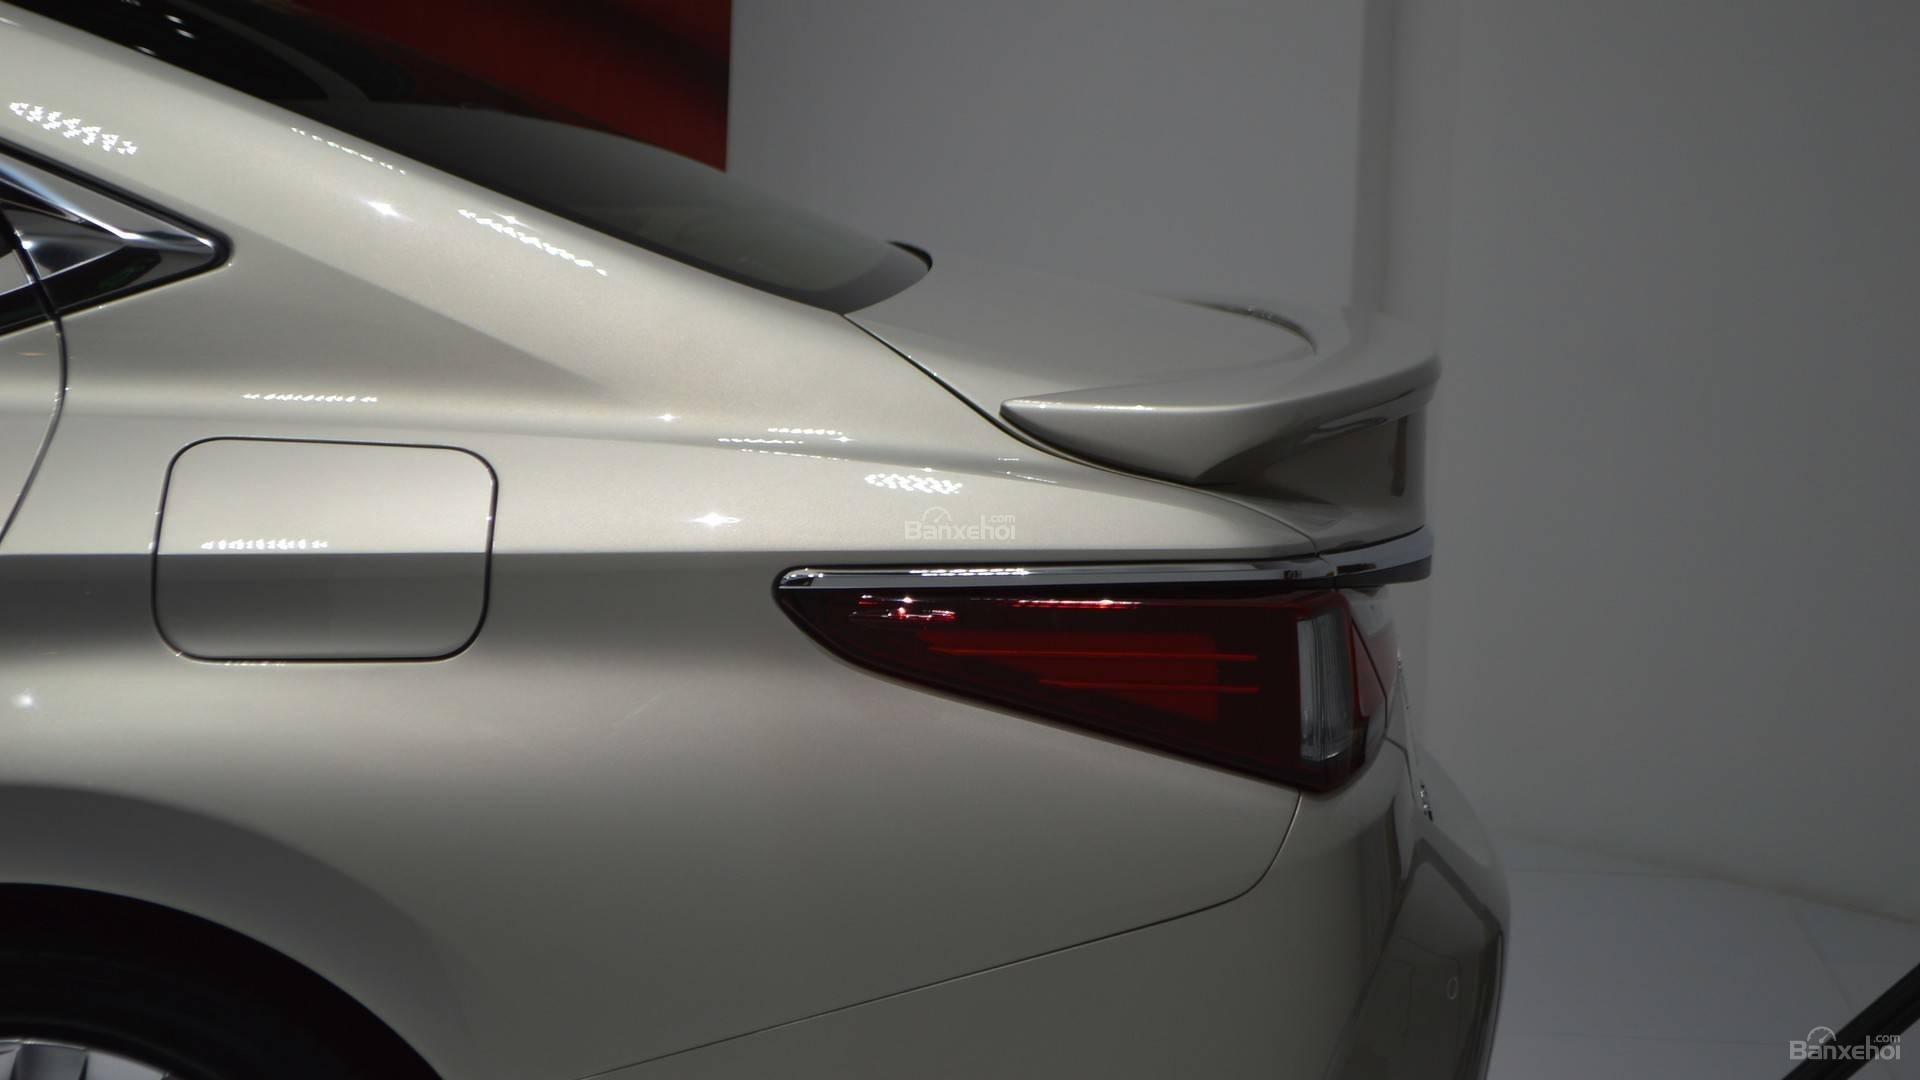 Đánh xe Lexus ES 2019: Cánh gió tích hợp z